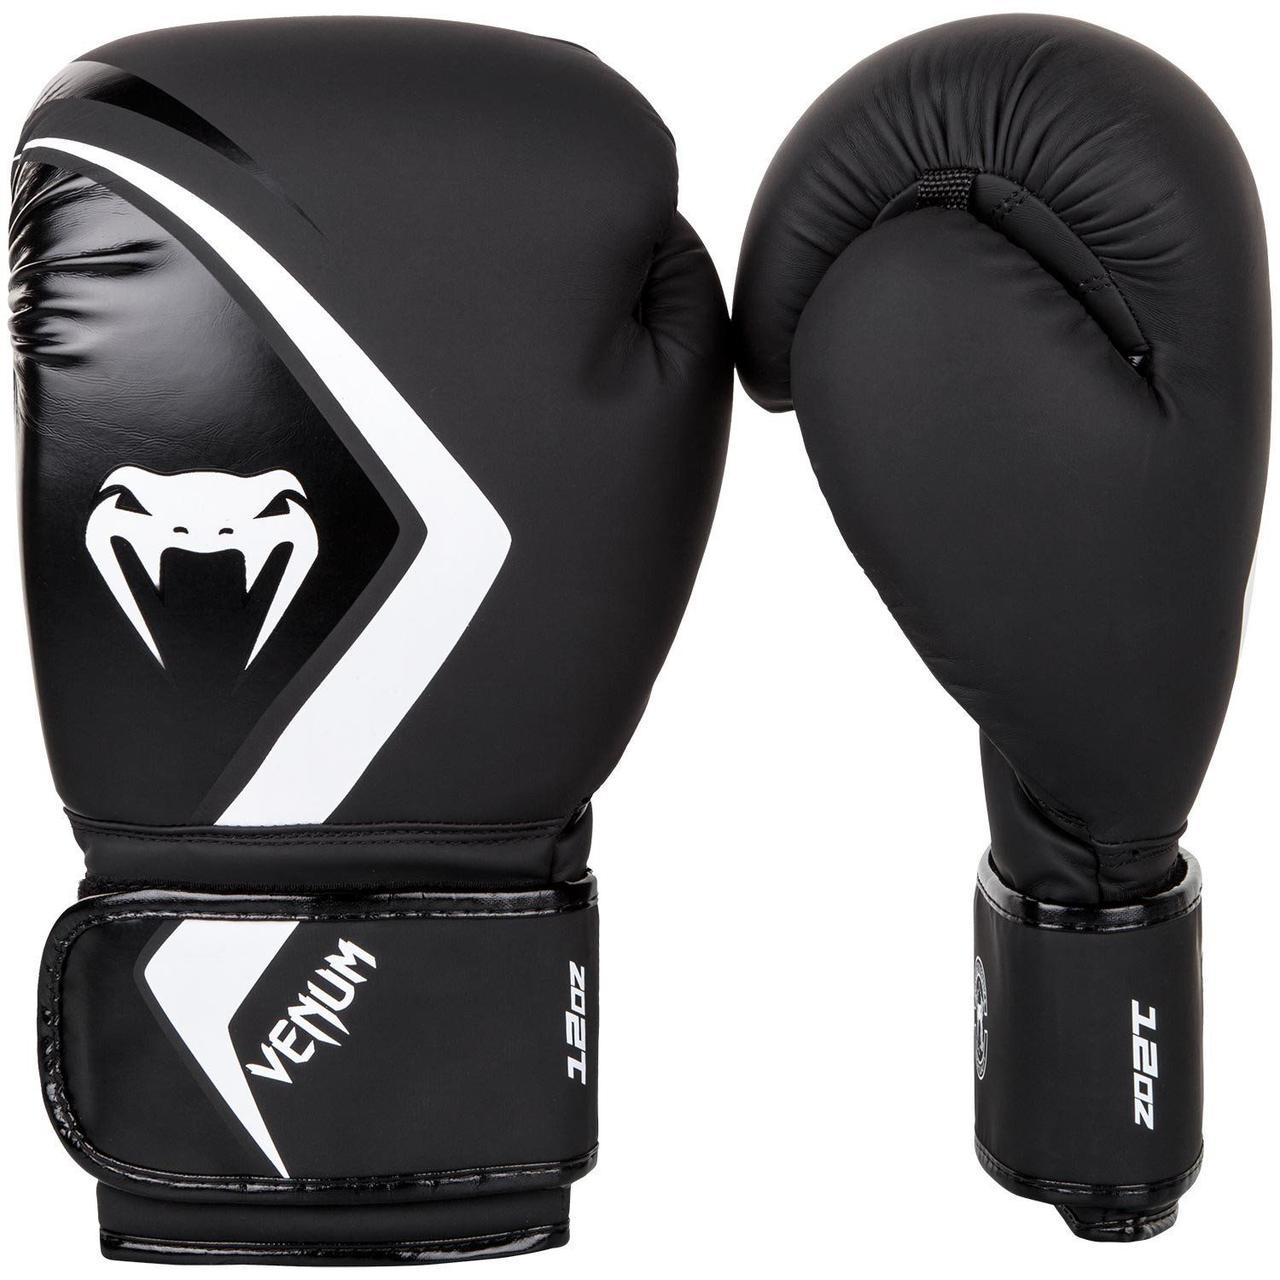 Боксерские перчатки Venum Contender 2/0 Black/Grey-White